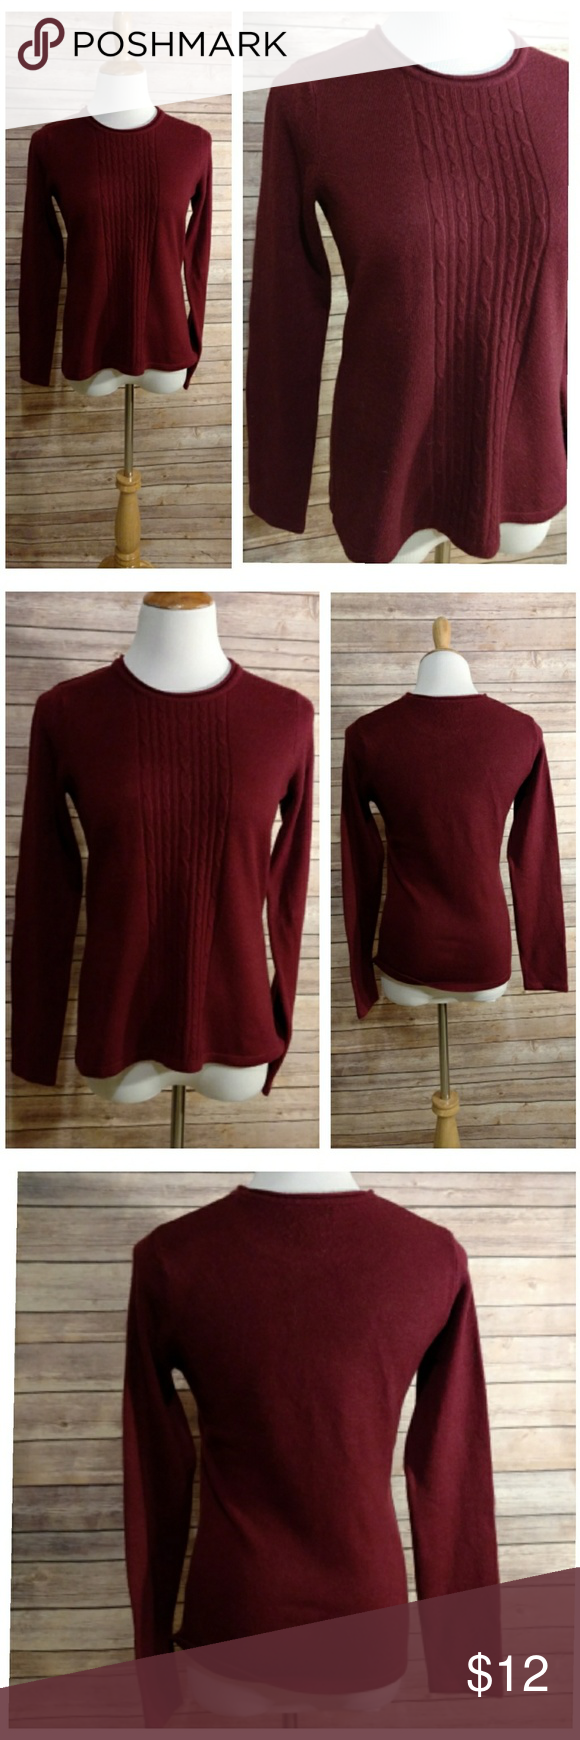 Croft u Barrow  Sweater  Barrow AFC Red sweaters and Dark red